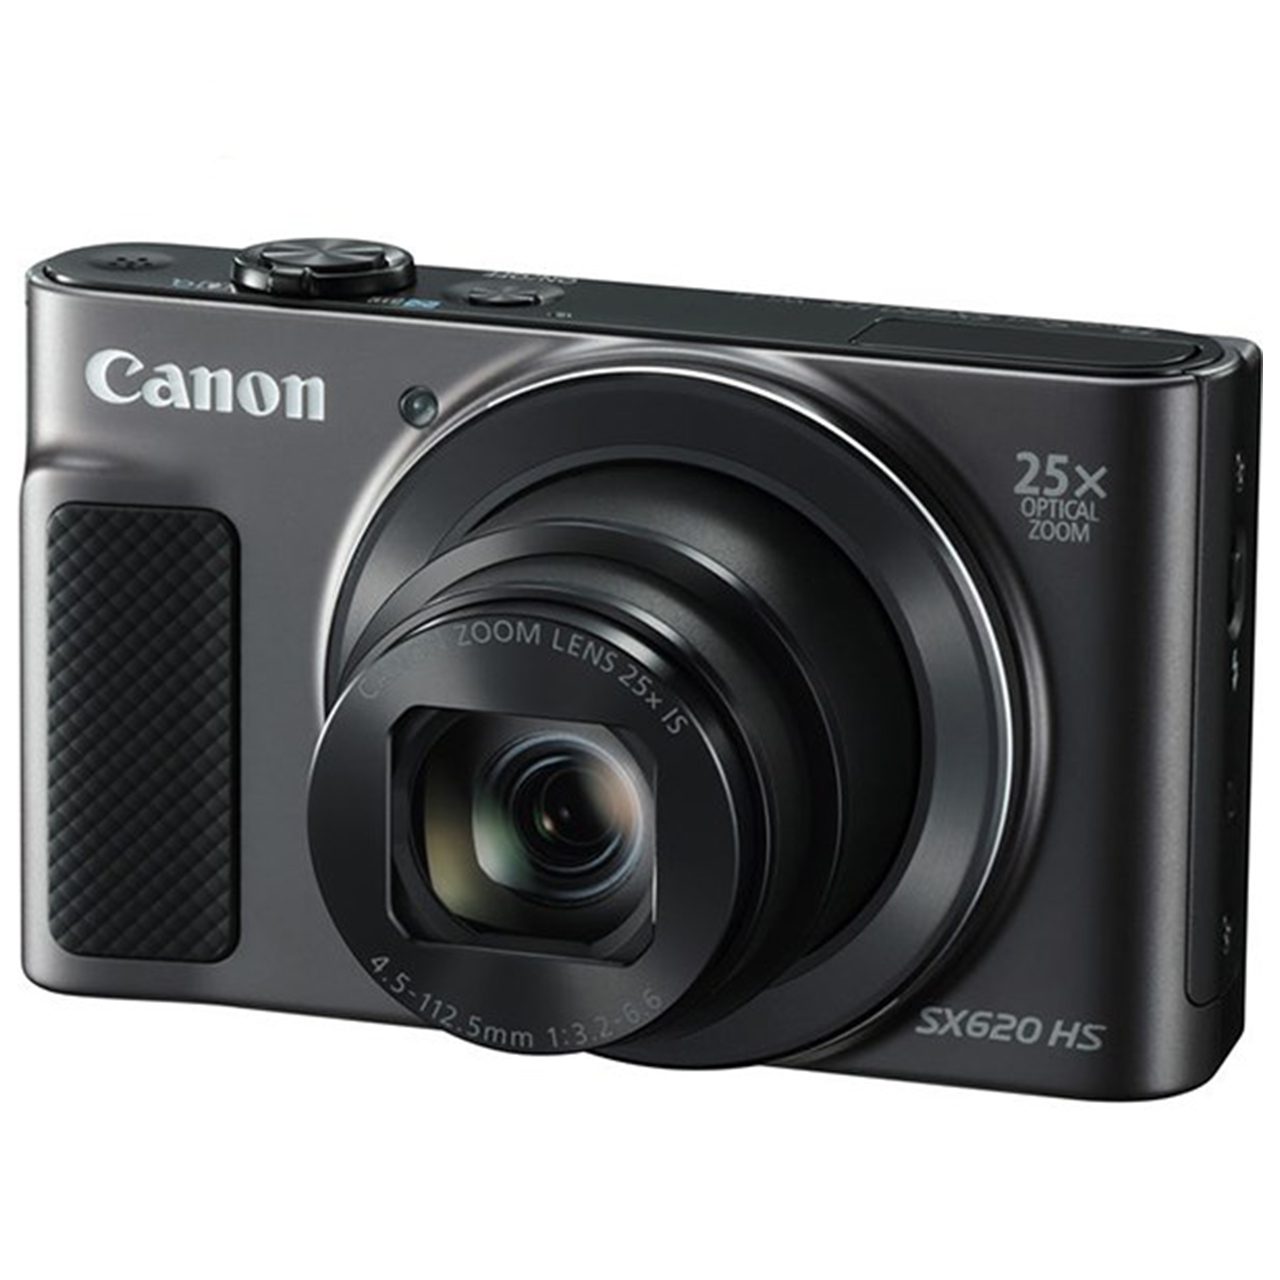 فروش نقدی و اقساطی دوربین دیجیتال کانن مدل SX620 HS